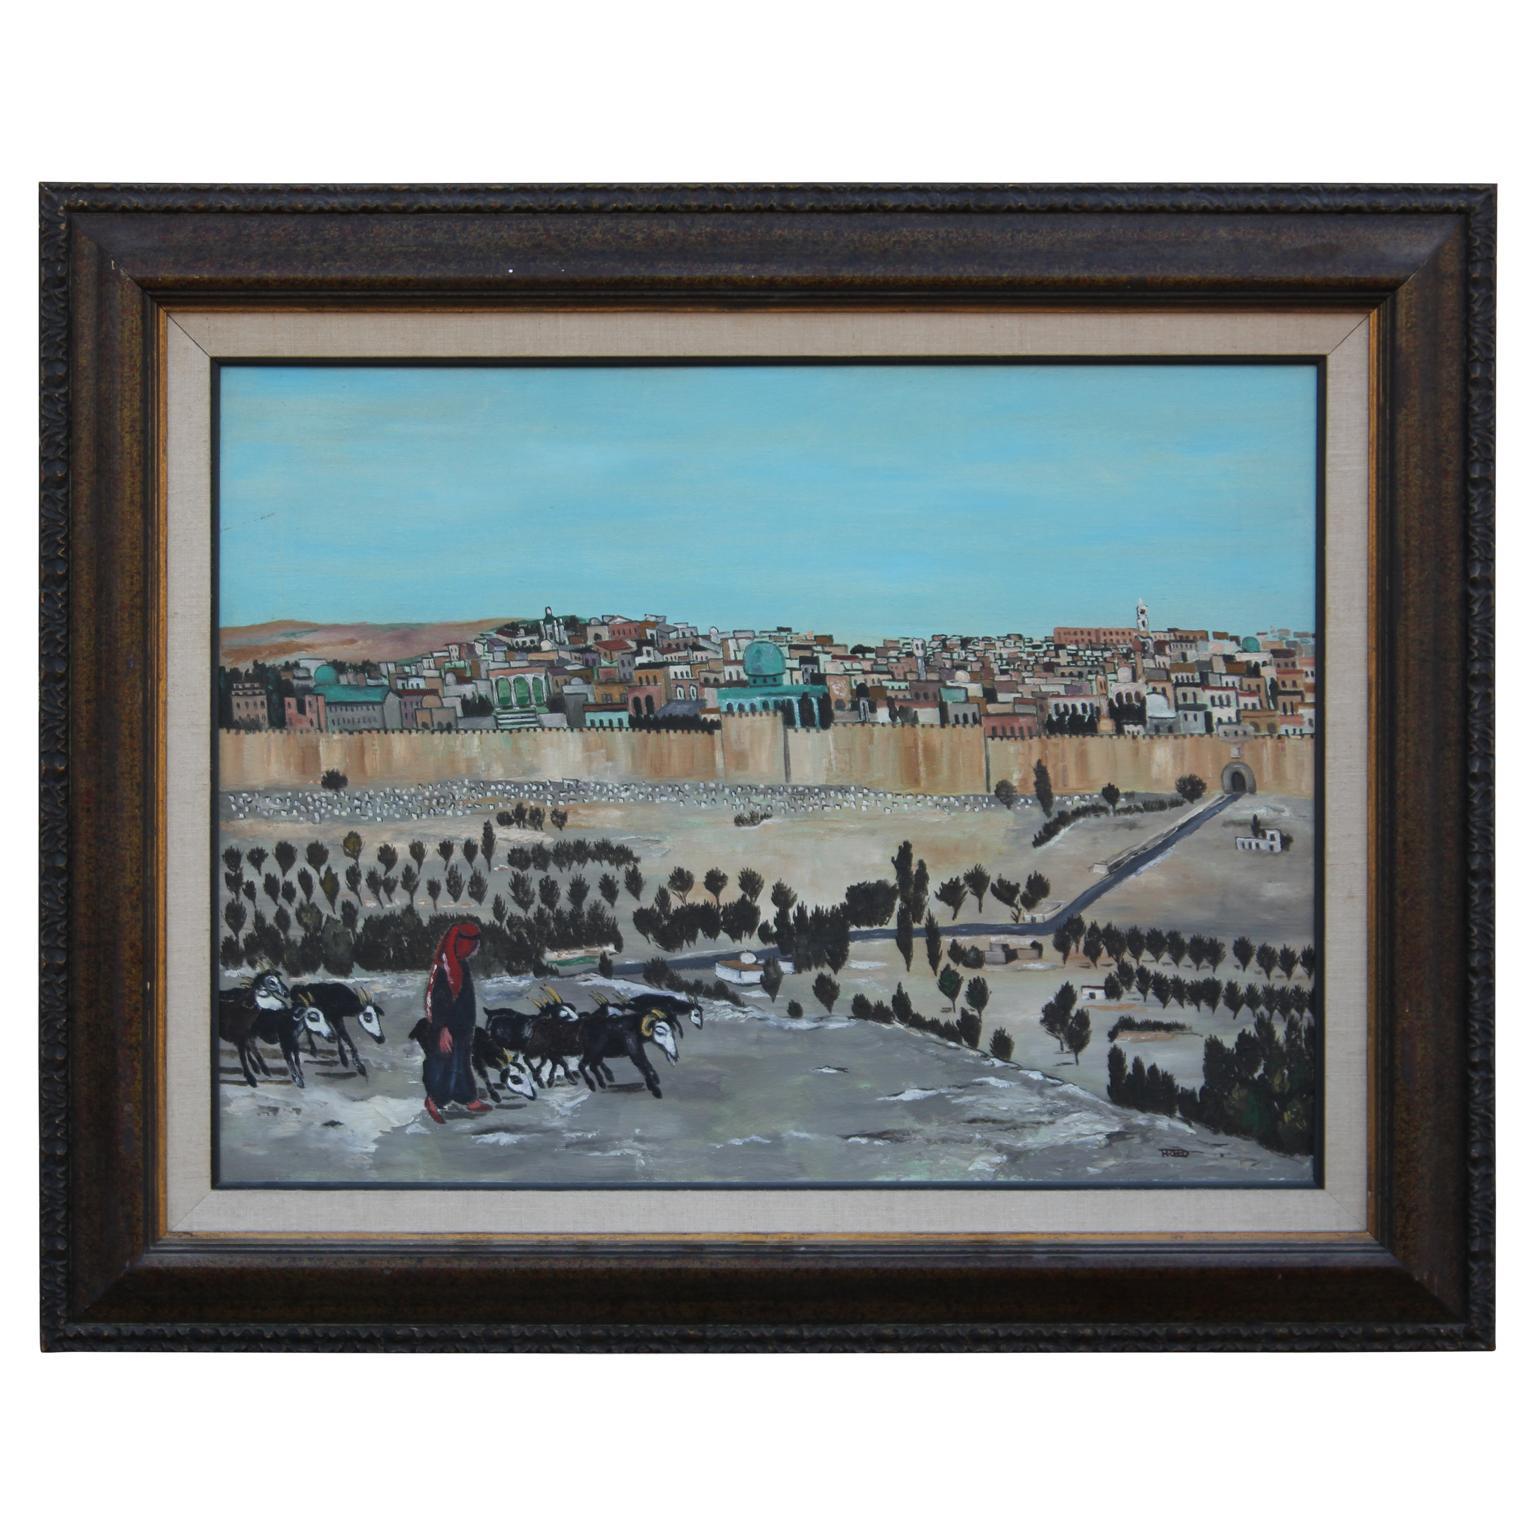 Impressionist Landscape Painting of the Holy City of Jerusalem